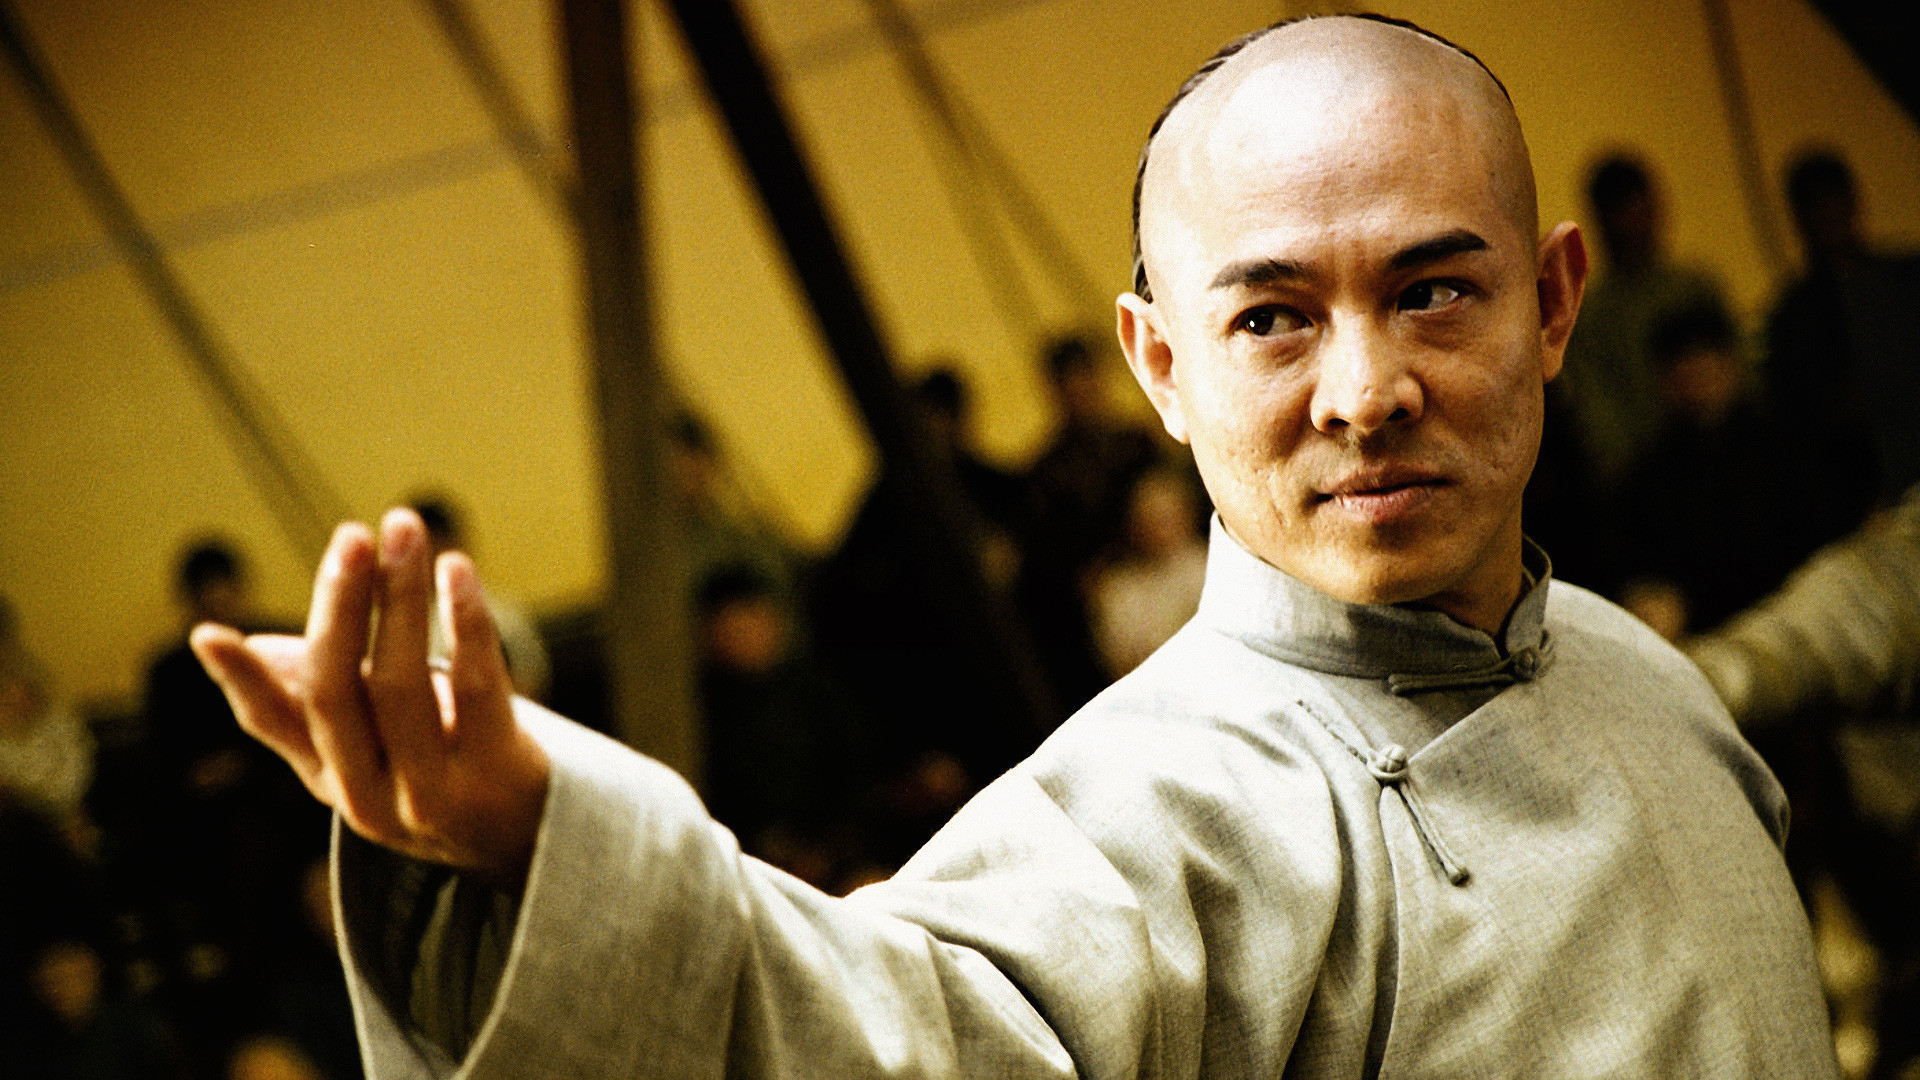 original wallpaper download: Kung fu master Jet Li - 1920x1080